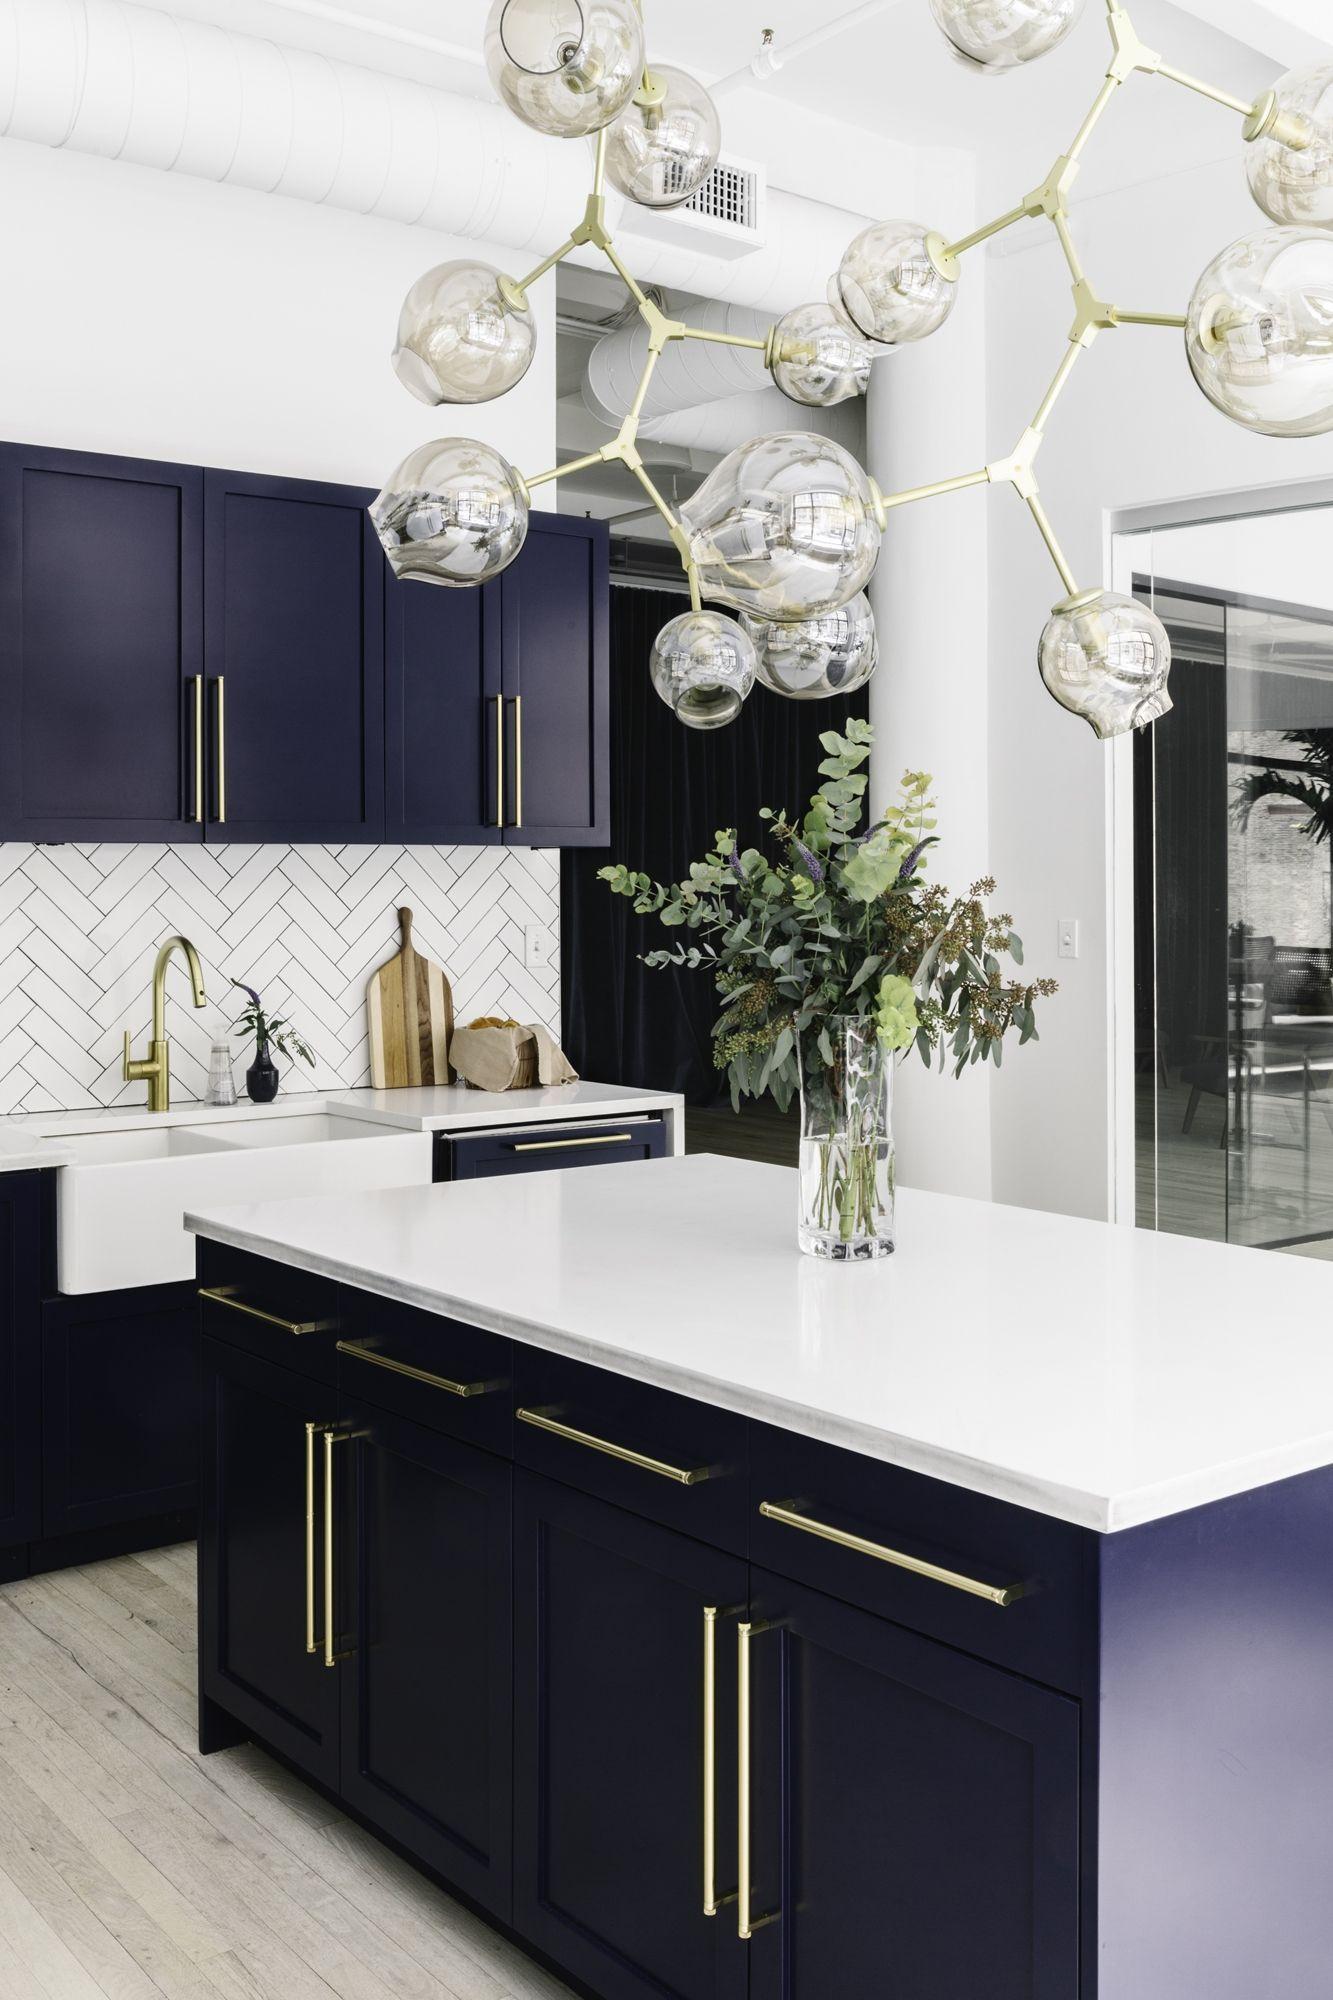 Trend Alert Add Mid Century Lamps To Your Kitchen Decor Kitchen Interior Interior Design Kitchen Kitchen Design,Roadside Design Guide Clear Zone Table